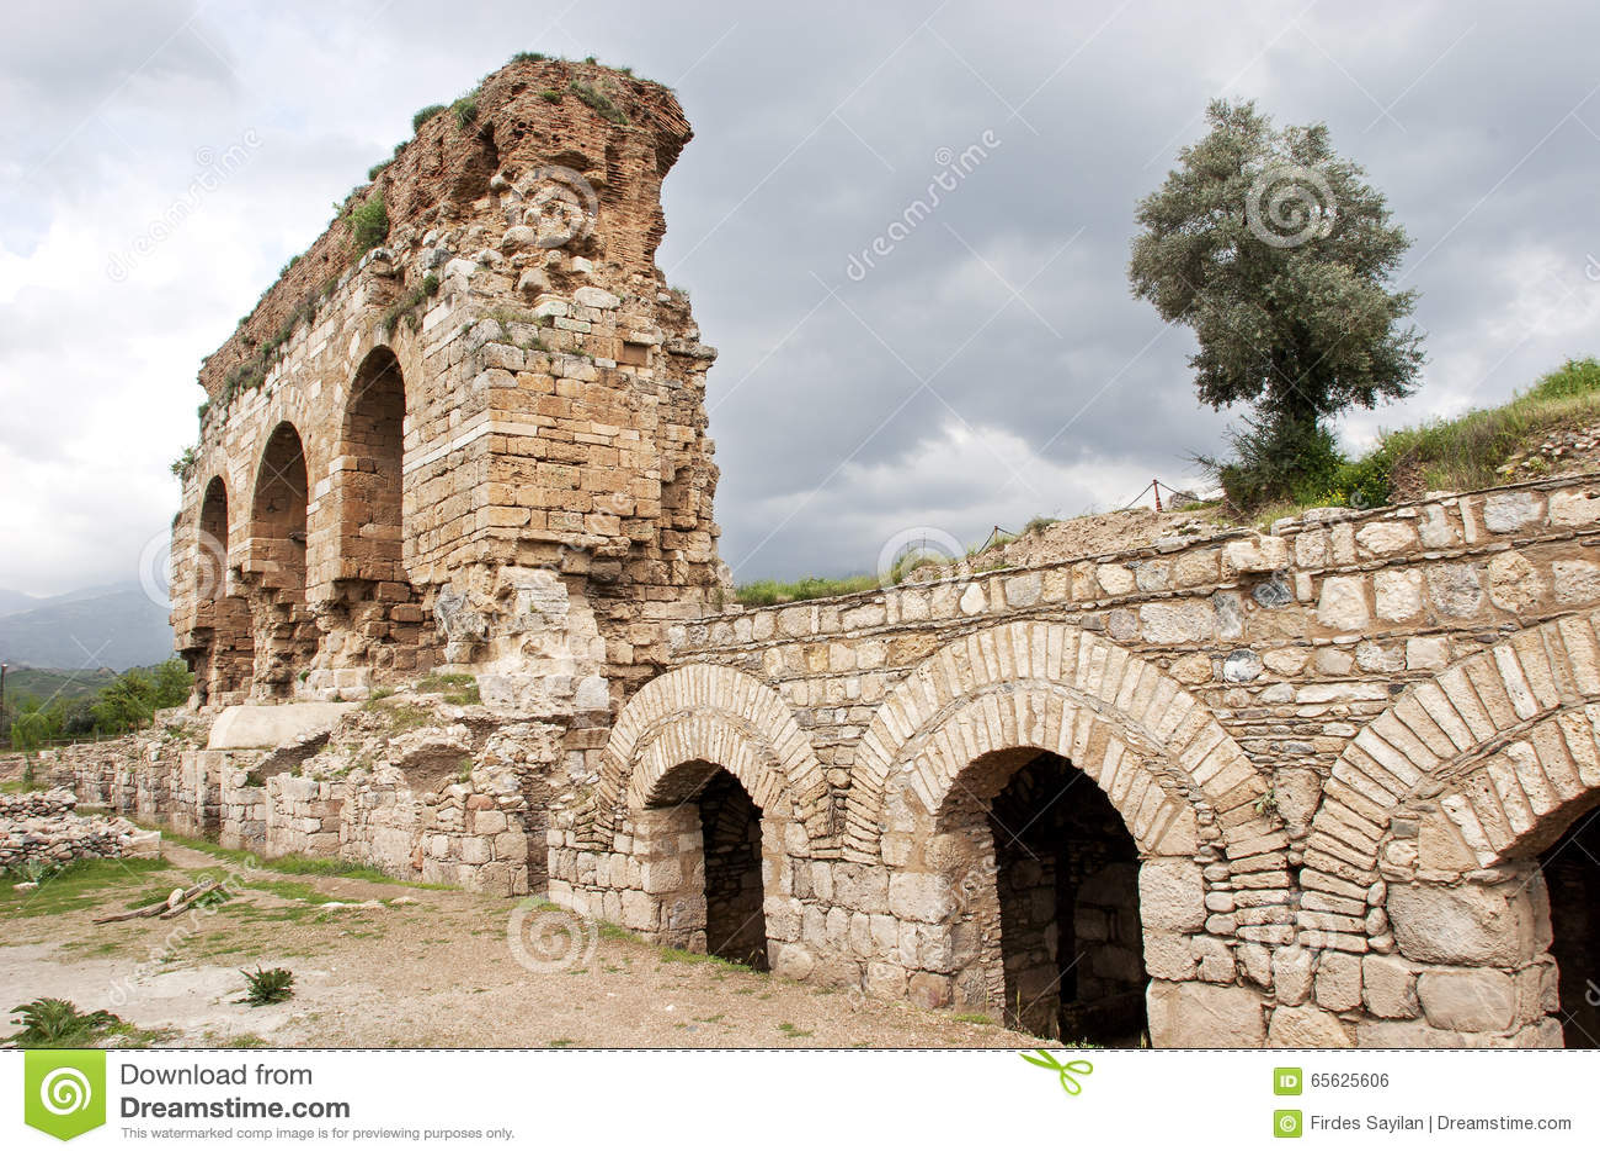 Ville antique de Tralleis, Turquie